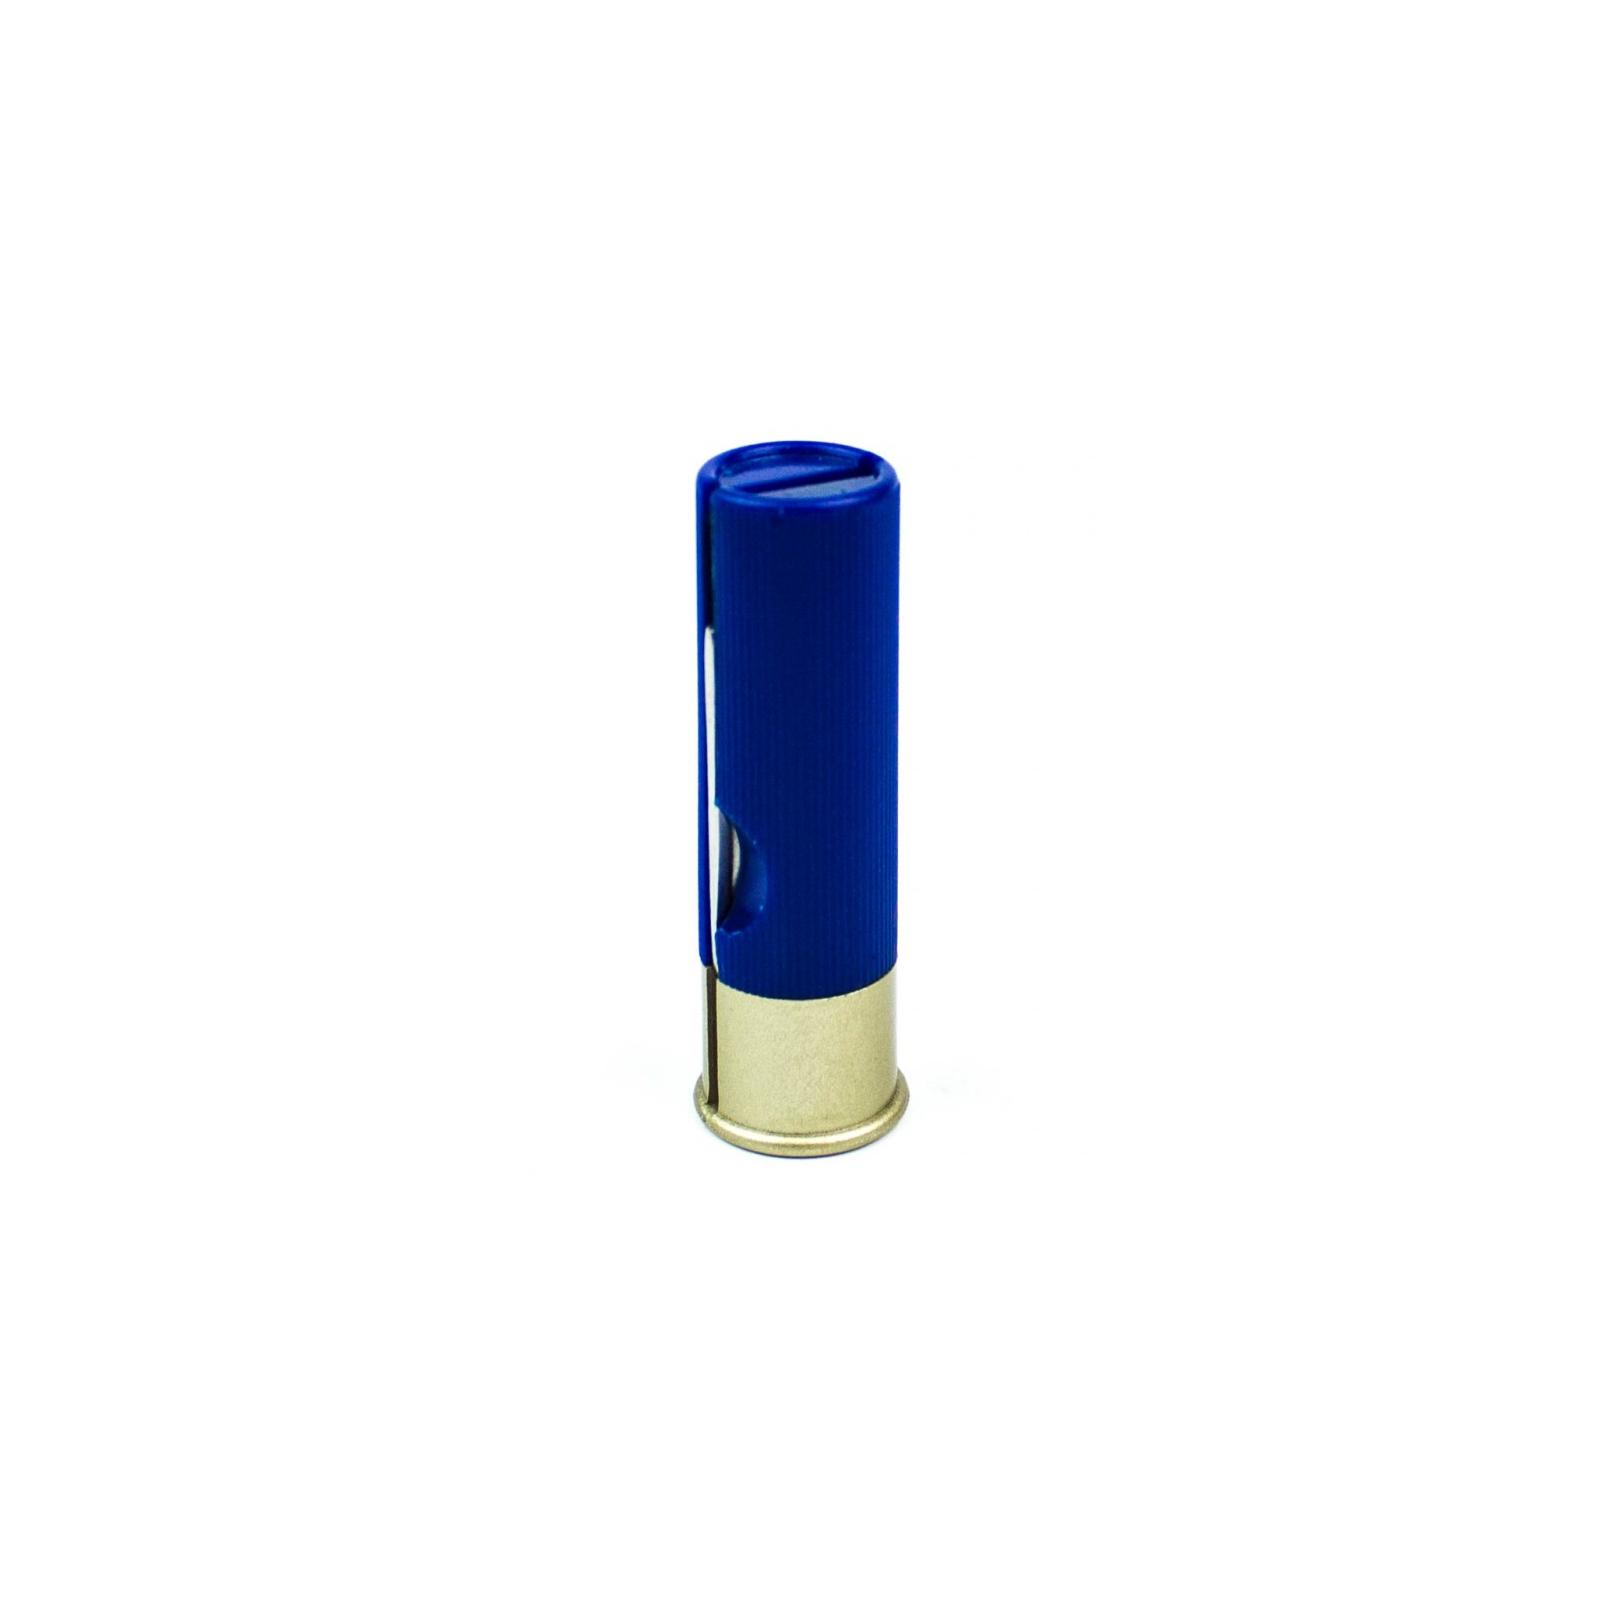 Нож Ganzo G624 синий (G624M-BL/G624S-BL) изображение 5